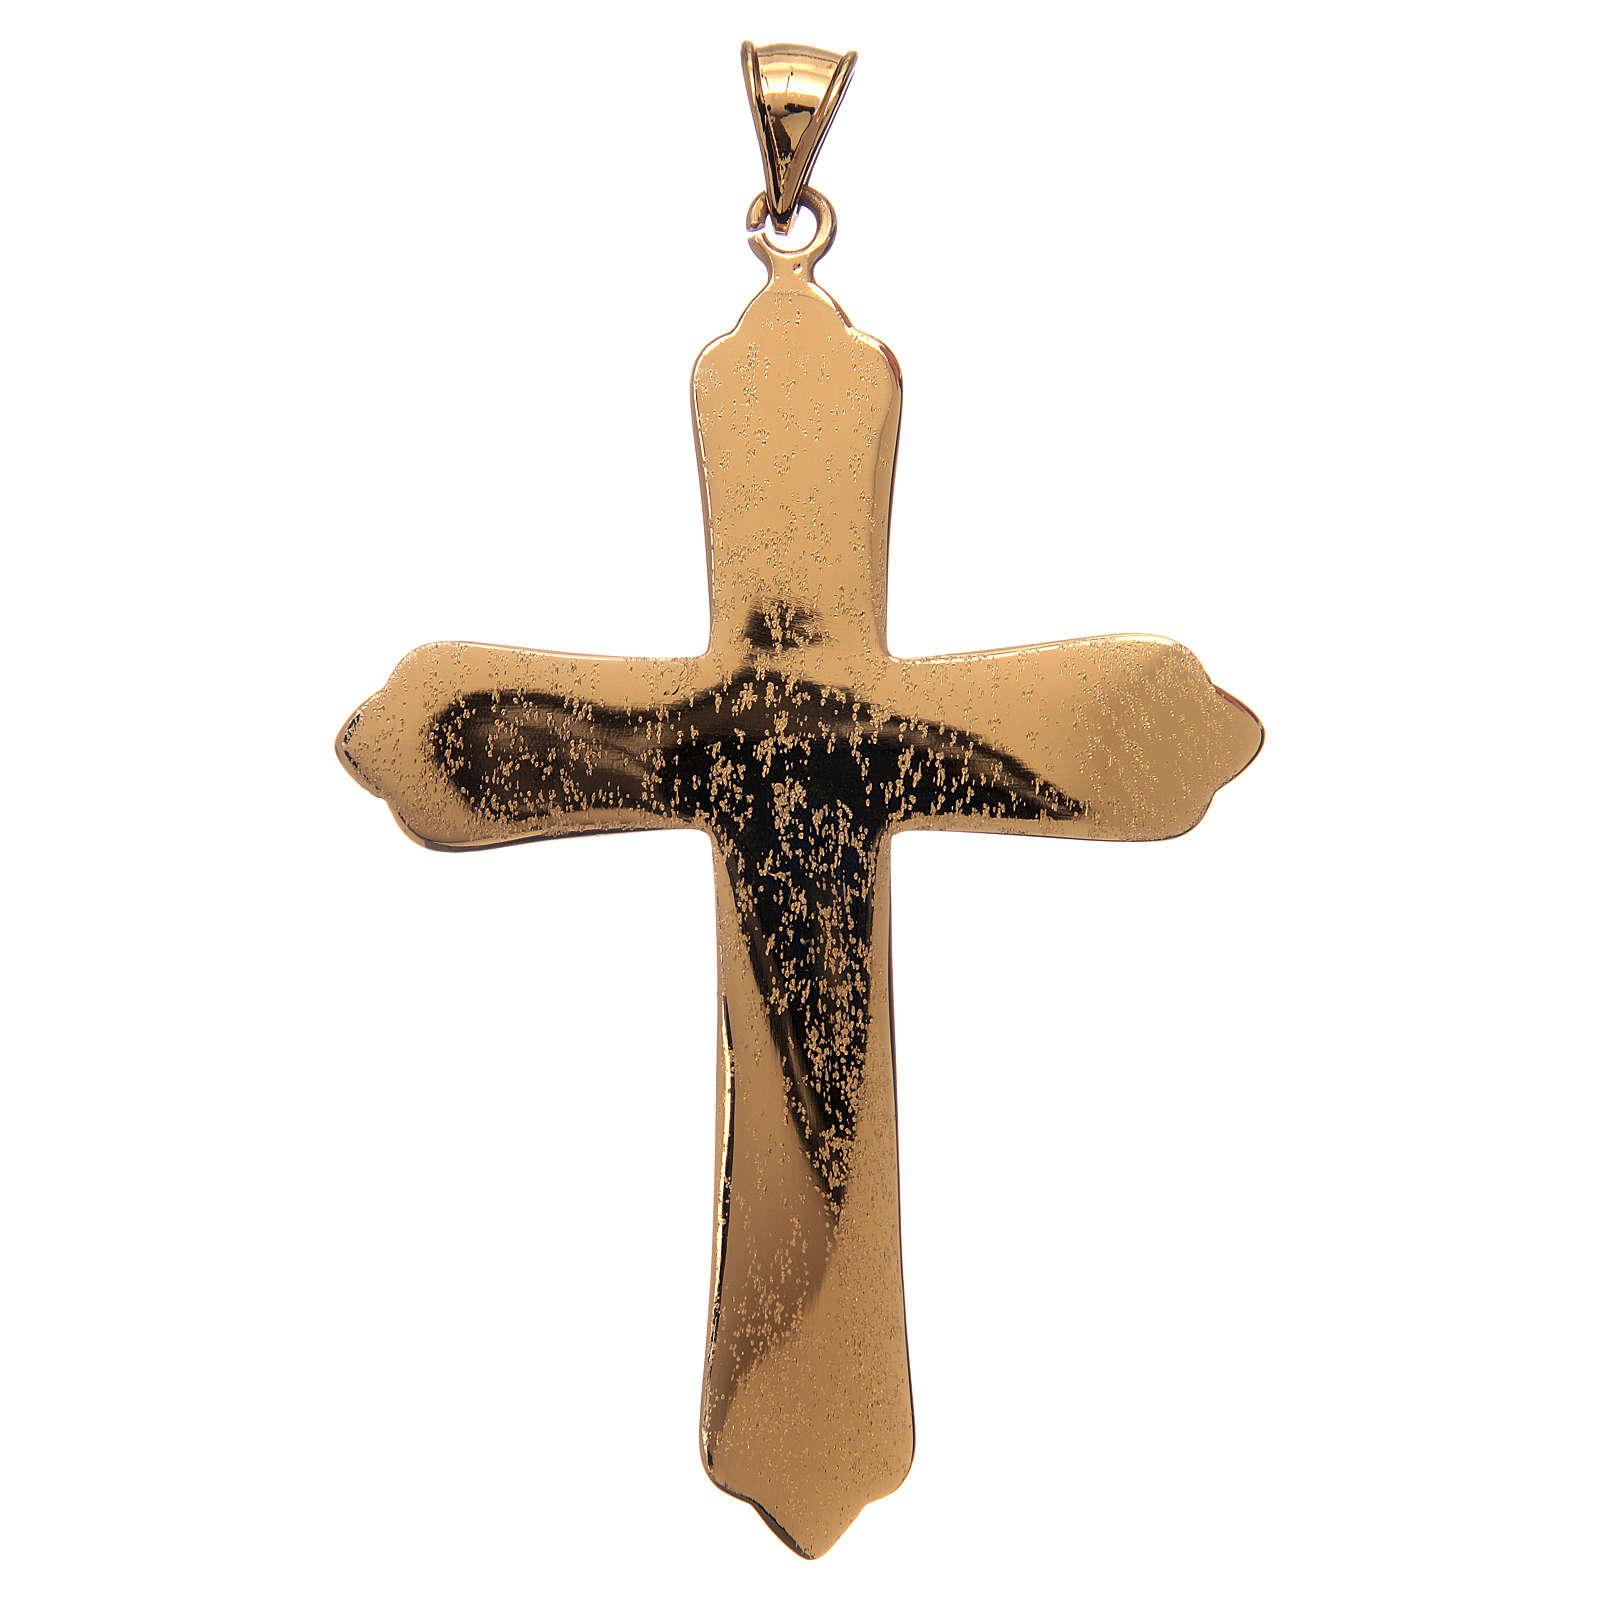 Cruz pectoral plata 925 dorada 4 evangelistas 3